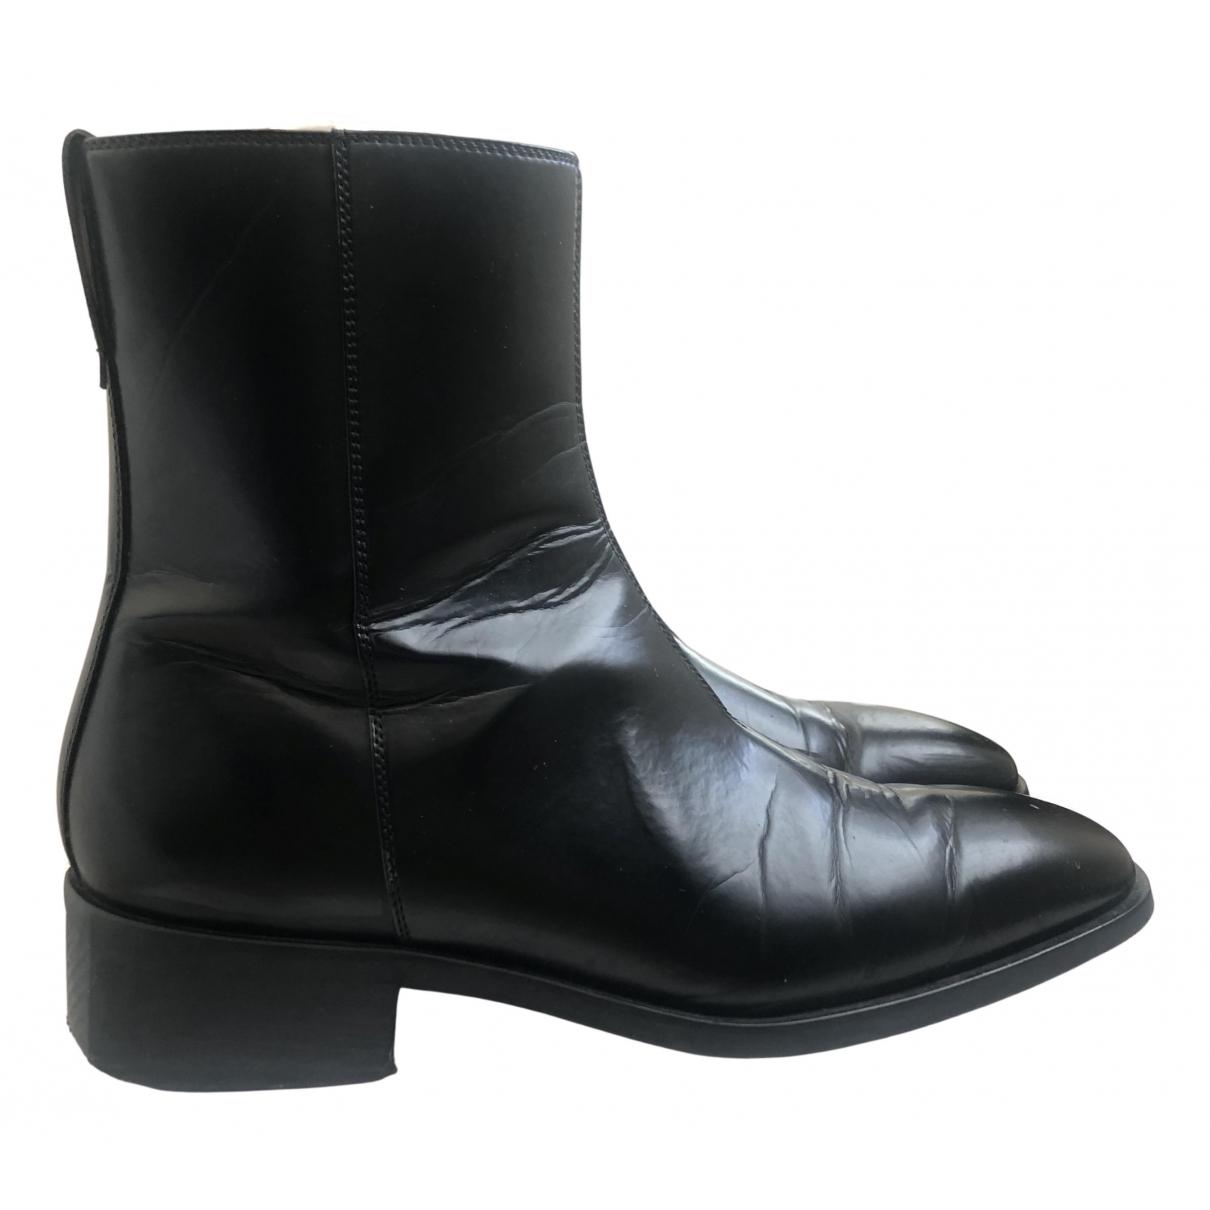 Stella Mccartney N Black Boots for Men 8.5 UK